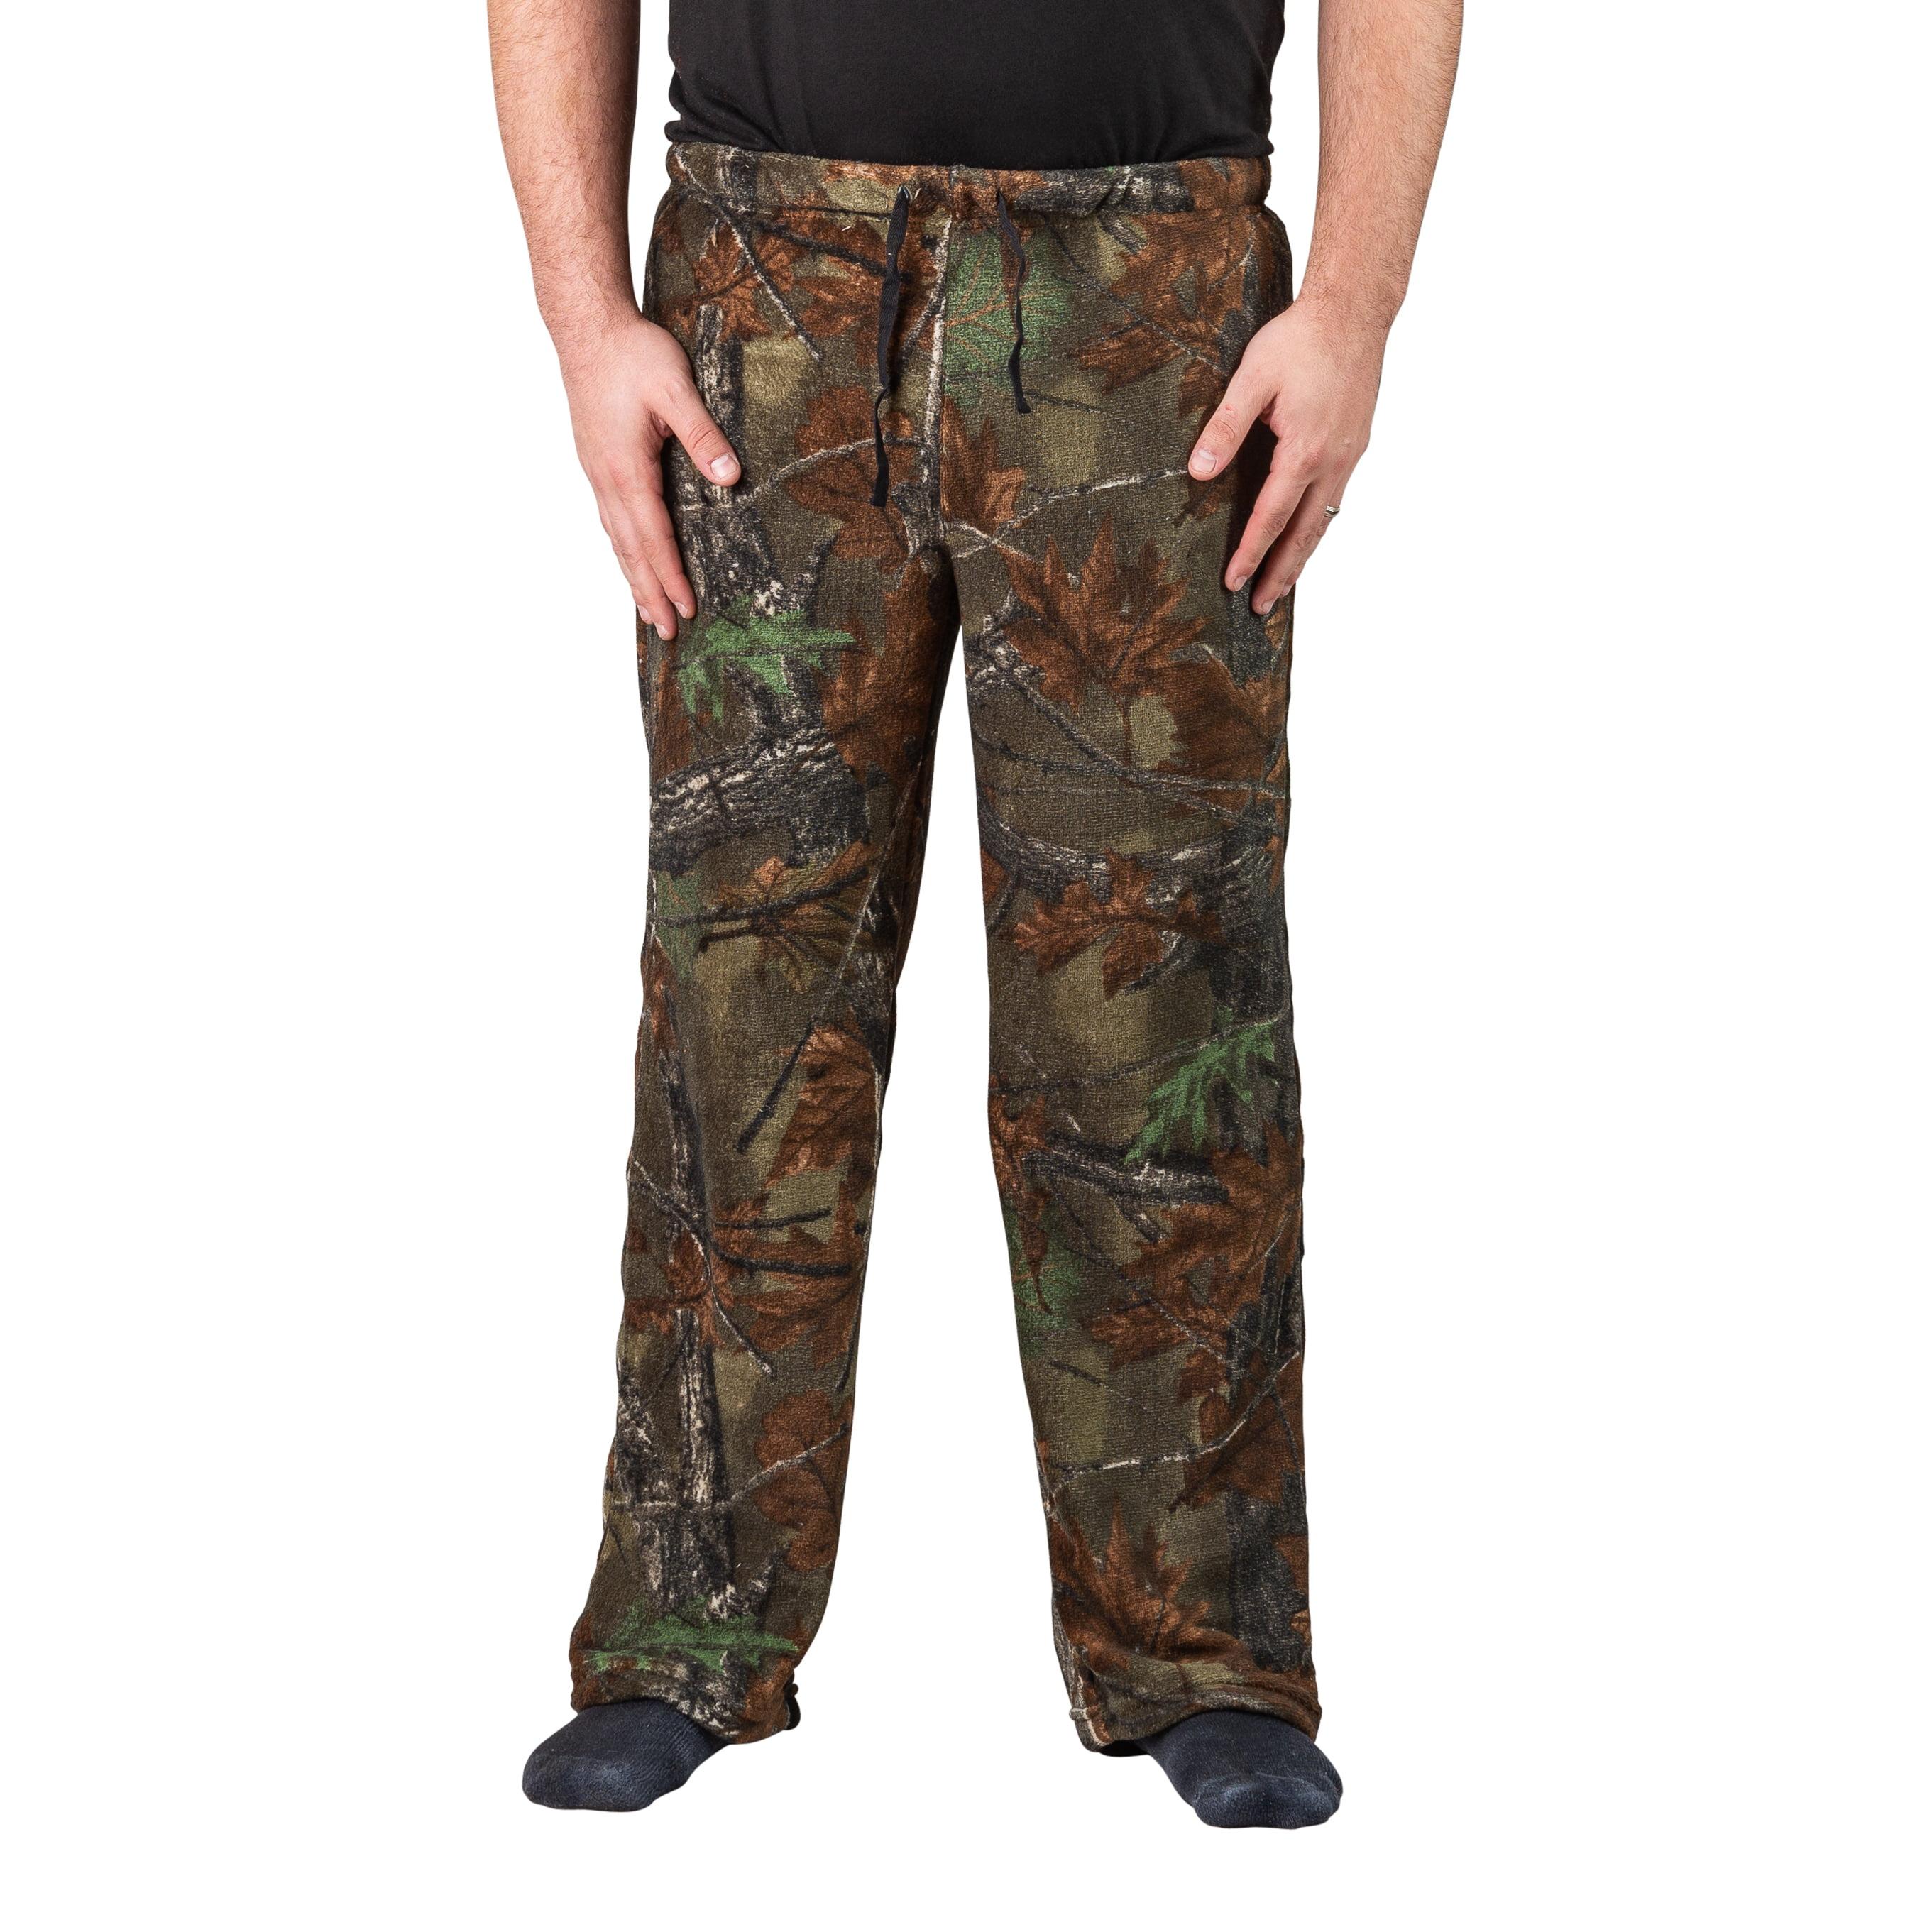 Mens Cargo Shorts Seahorse Shell Pattern Adjustable Shorts